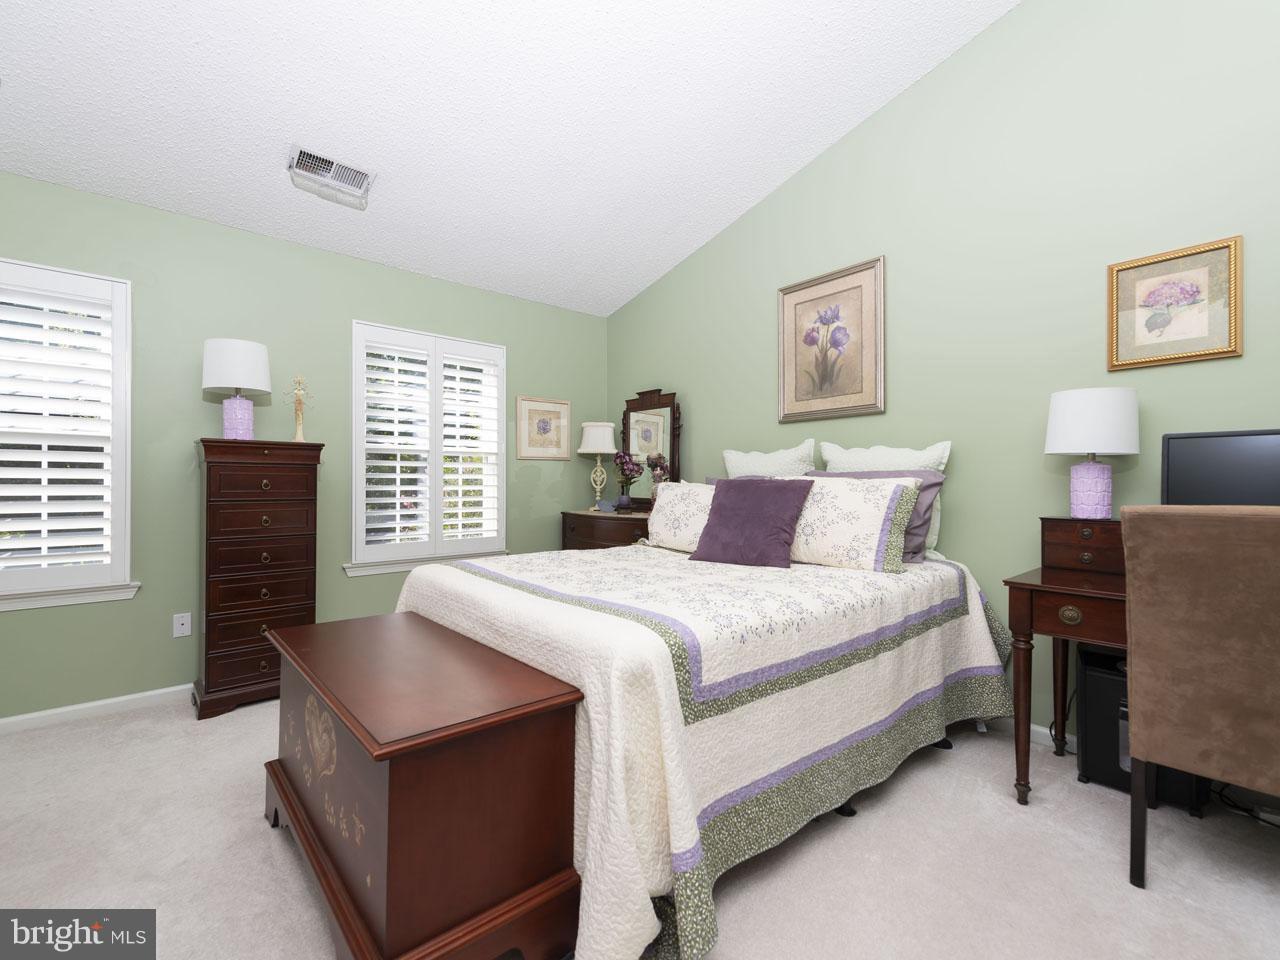 1002640508-300537944256-2021-07-22-05-00-37     Pinecrest   Alexandria Delaware Real Estate For Sale   MLS# 1002640508  - Best of Northern Virginia